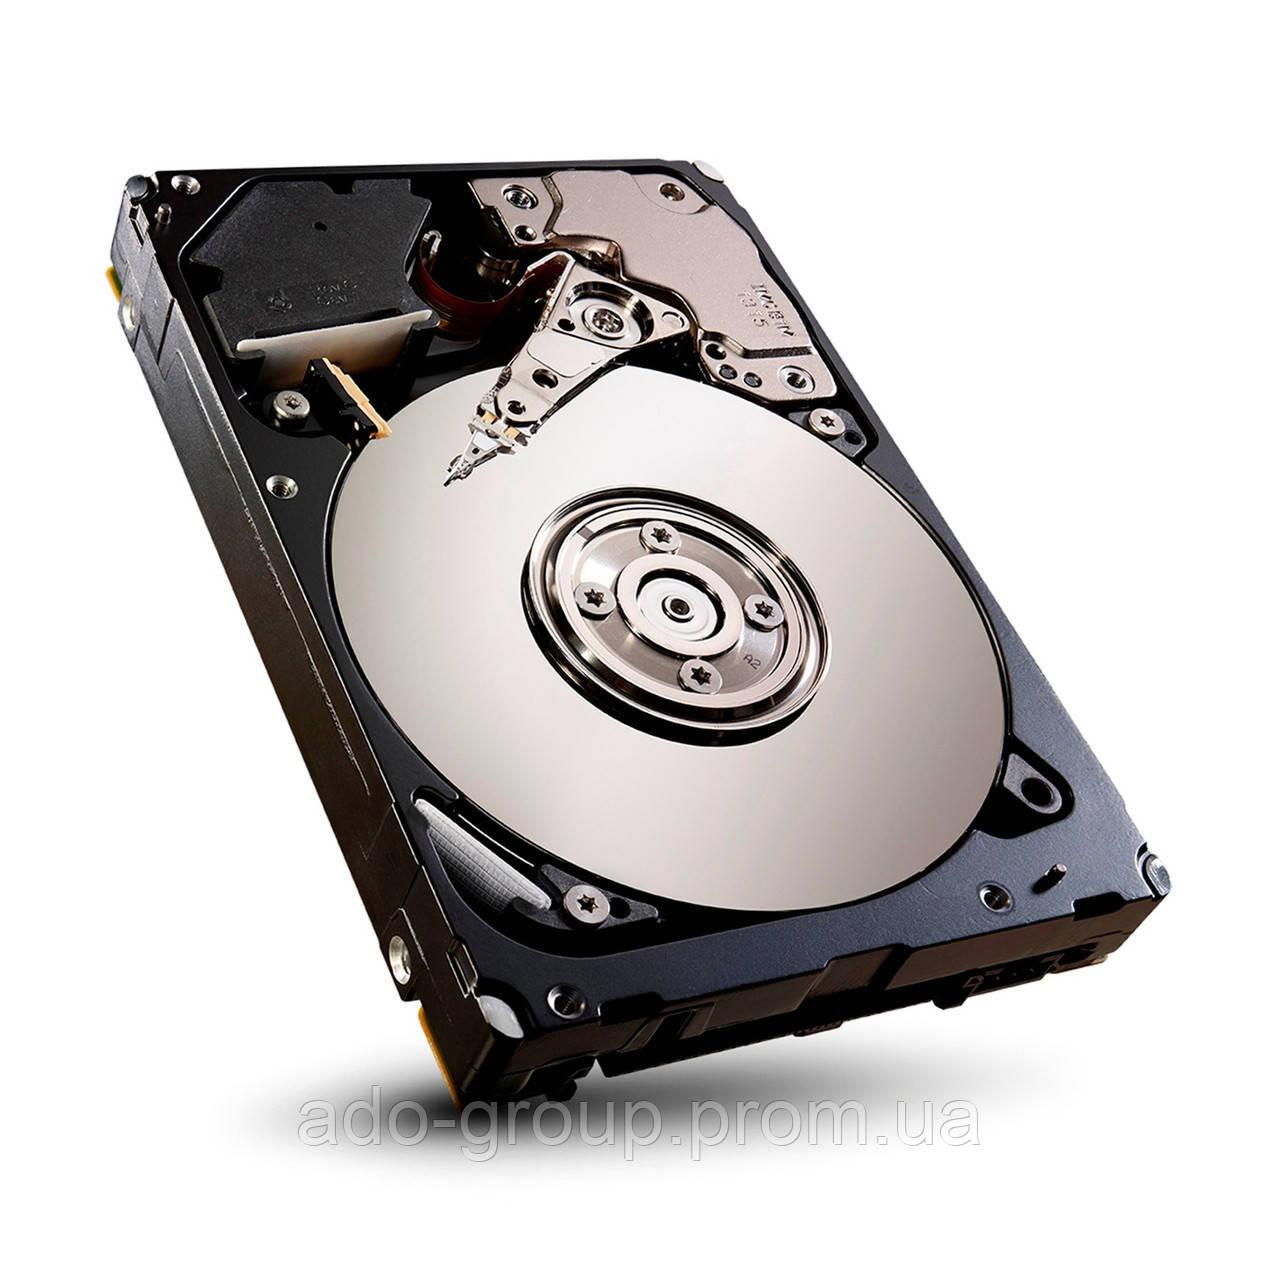 "417855-B21 Жесткий диск HP 146GB SAS 15K  3.5"" +"